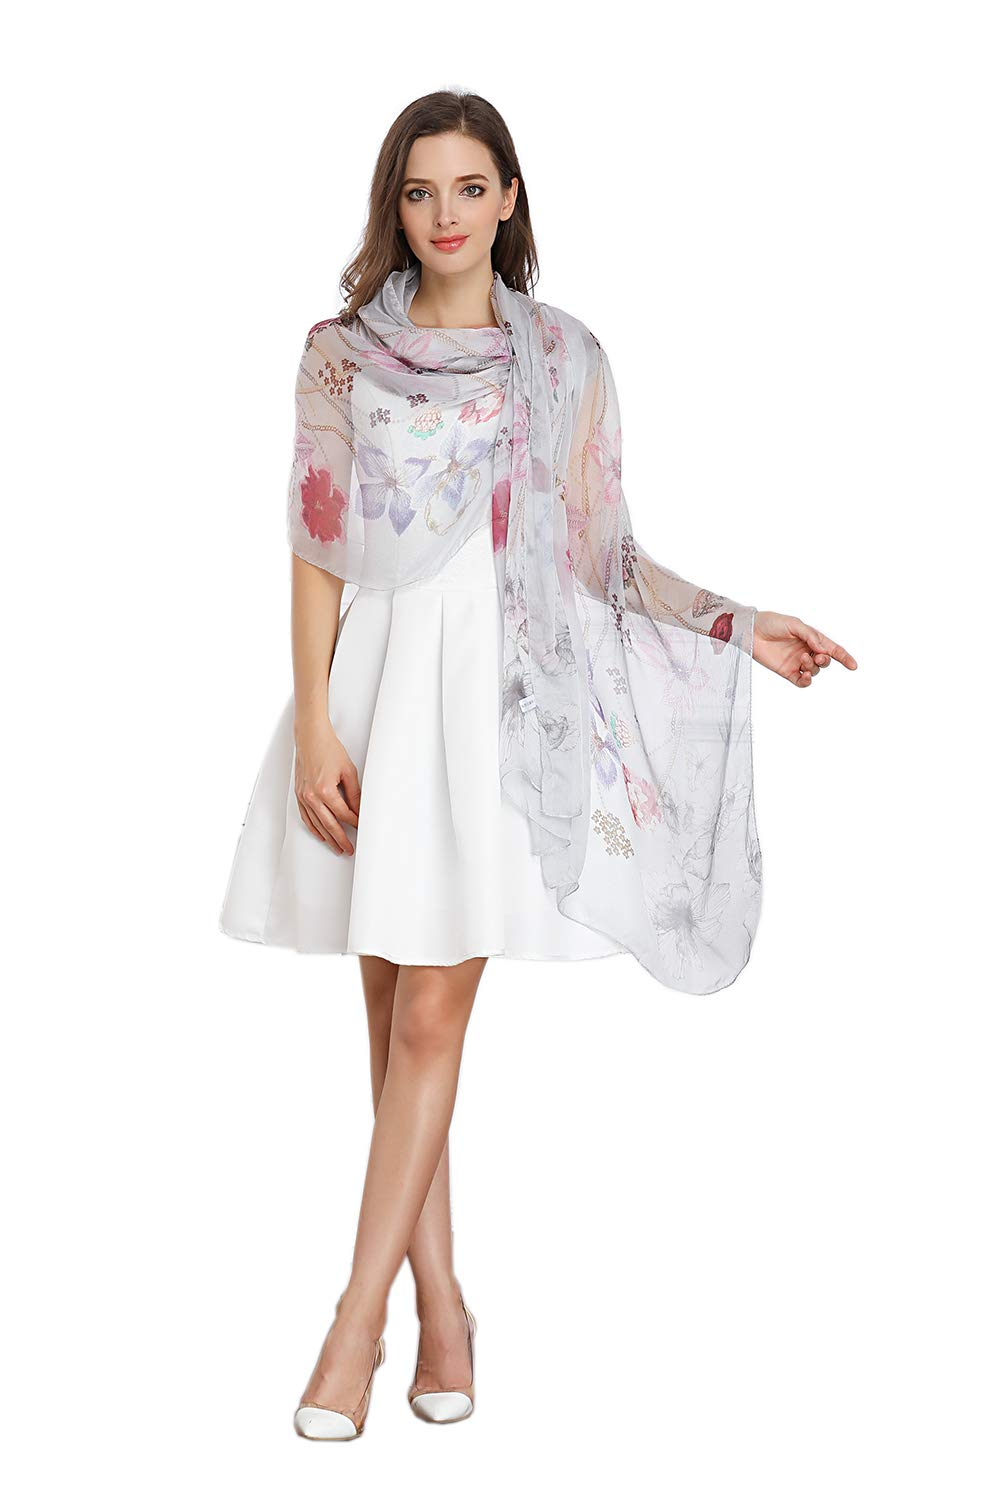 Women Fashion Silk Scarf Oblong Floral Oversize Soft Shawl Beach Wrap (Lightgrey)